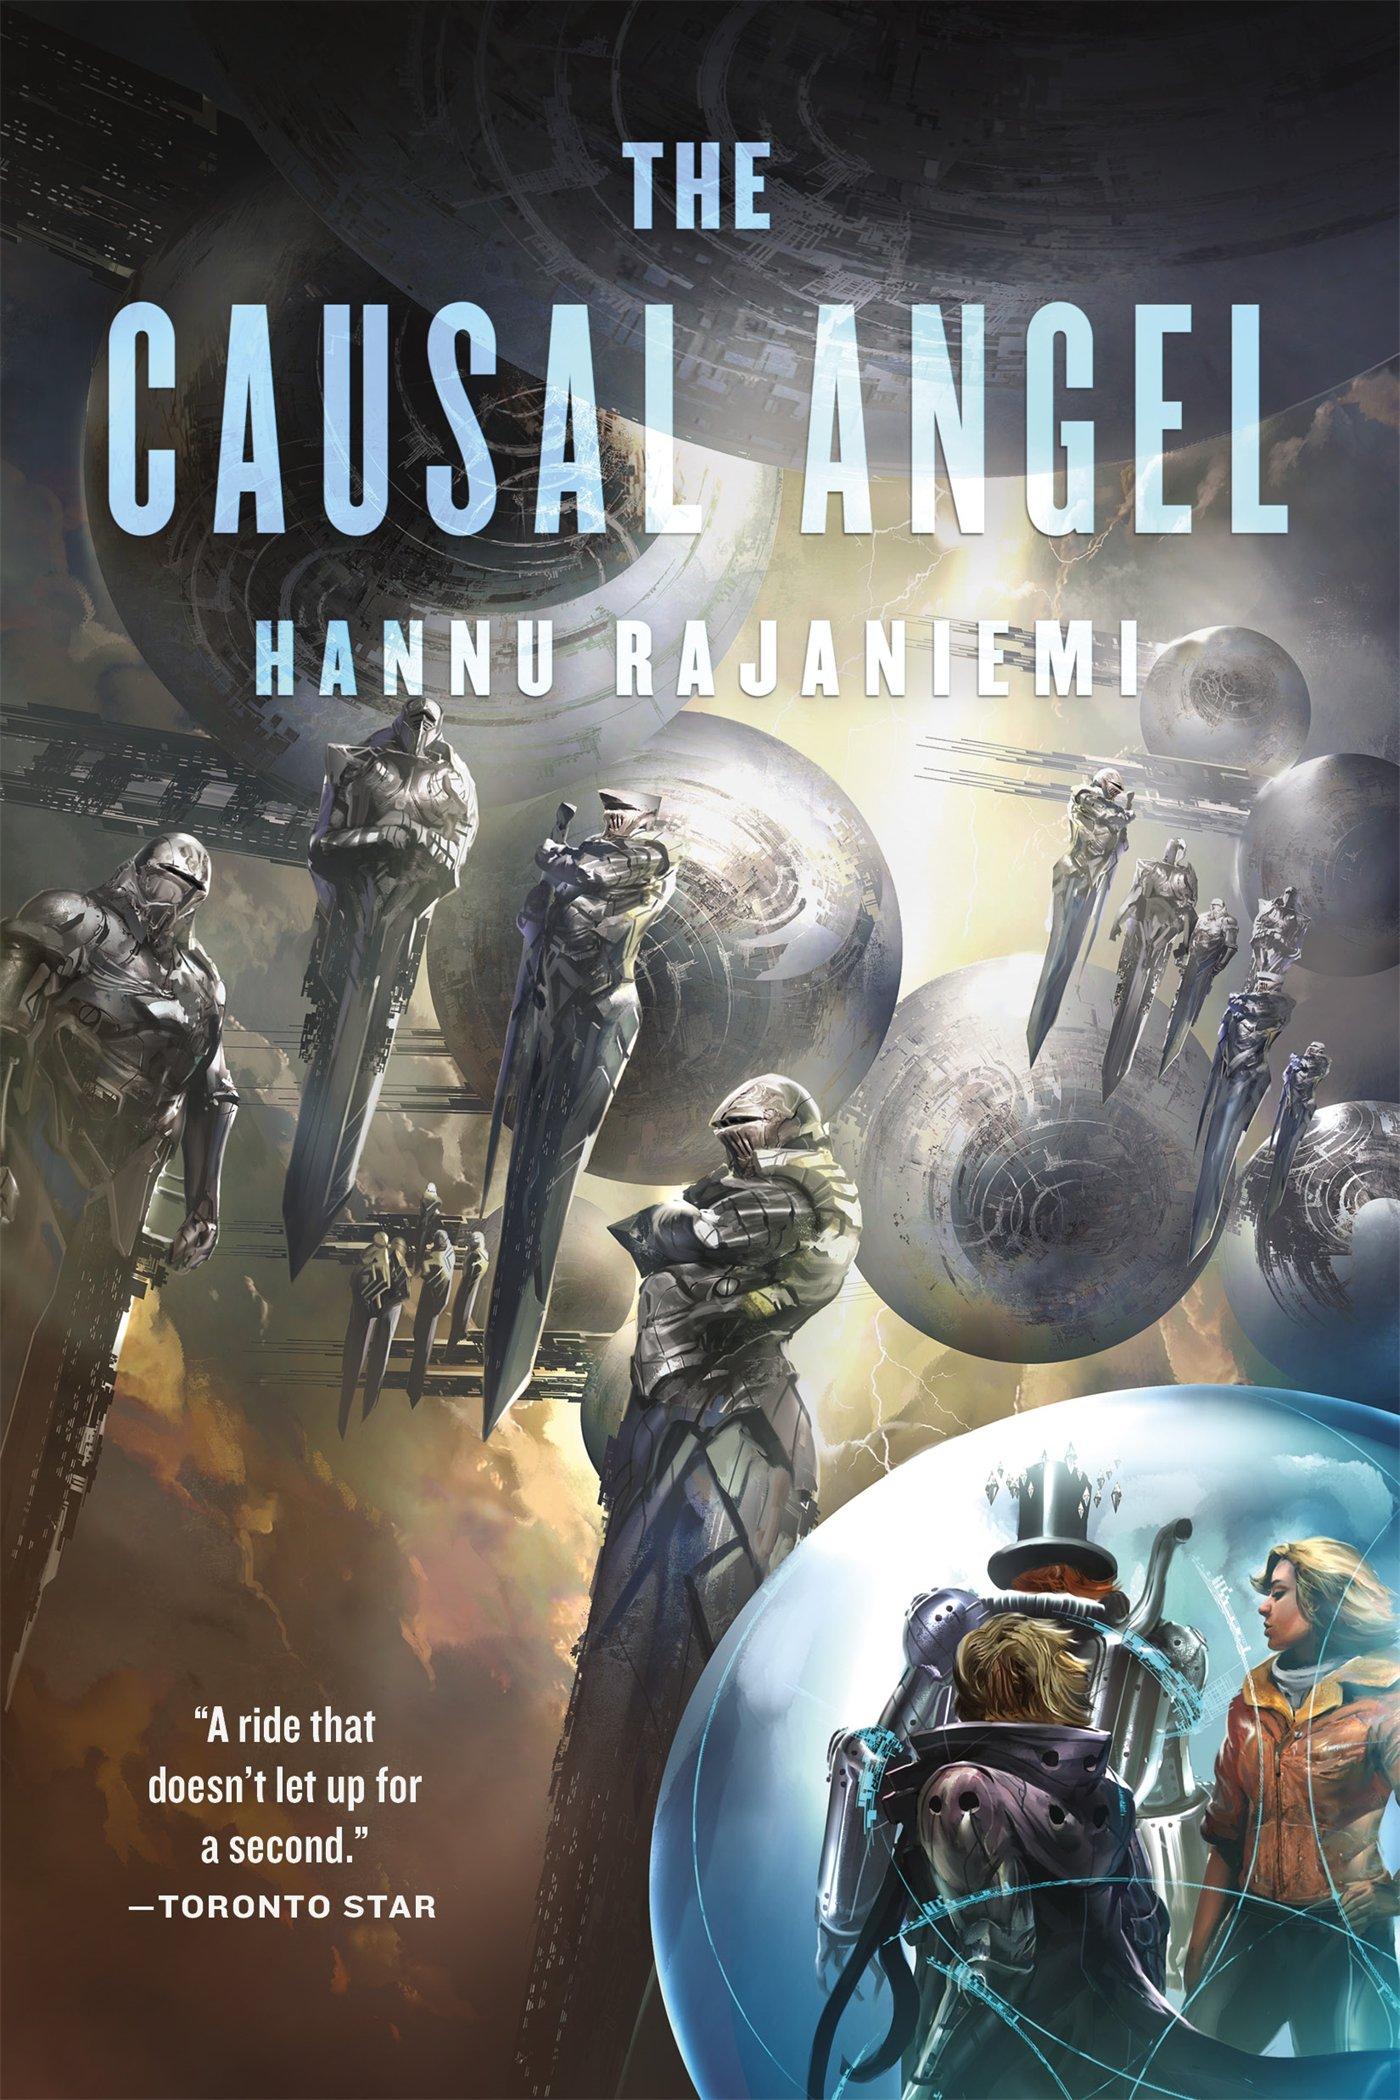 Amazon: The Causal Angel (jean Le Flambeur): Hannu Rajaniemi: Books